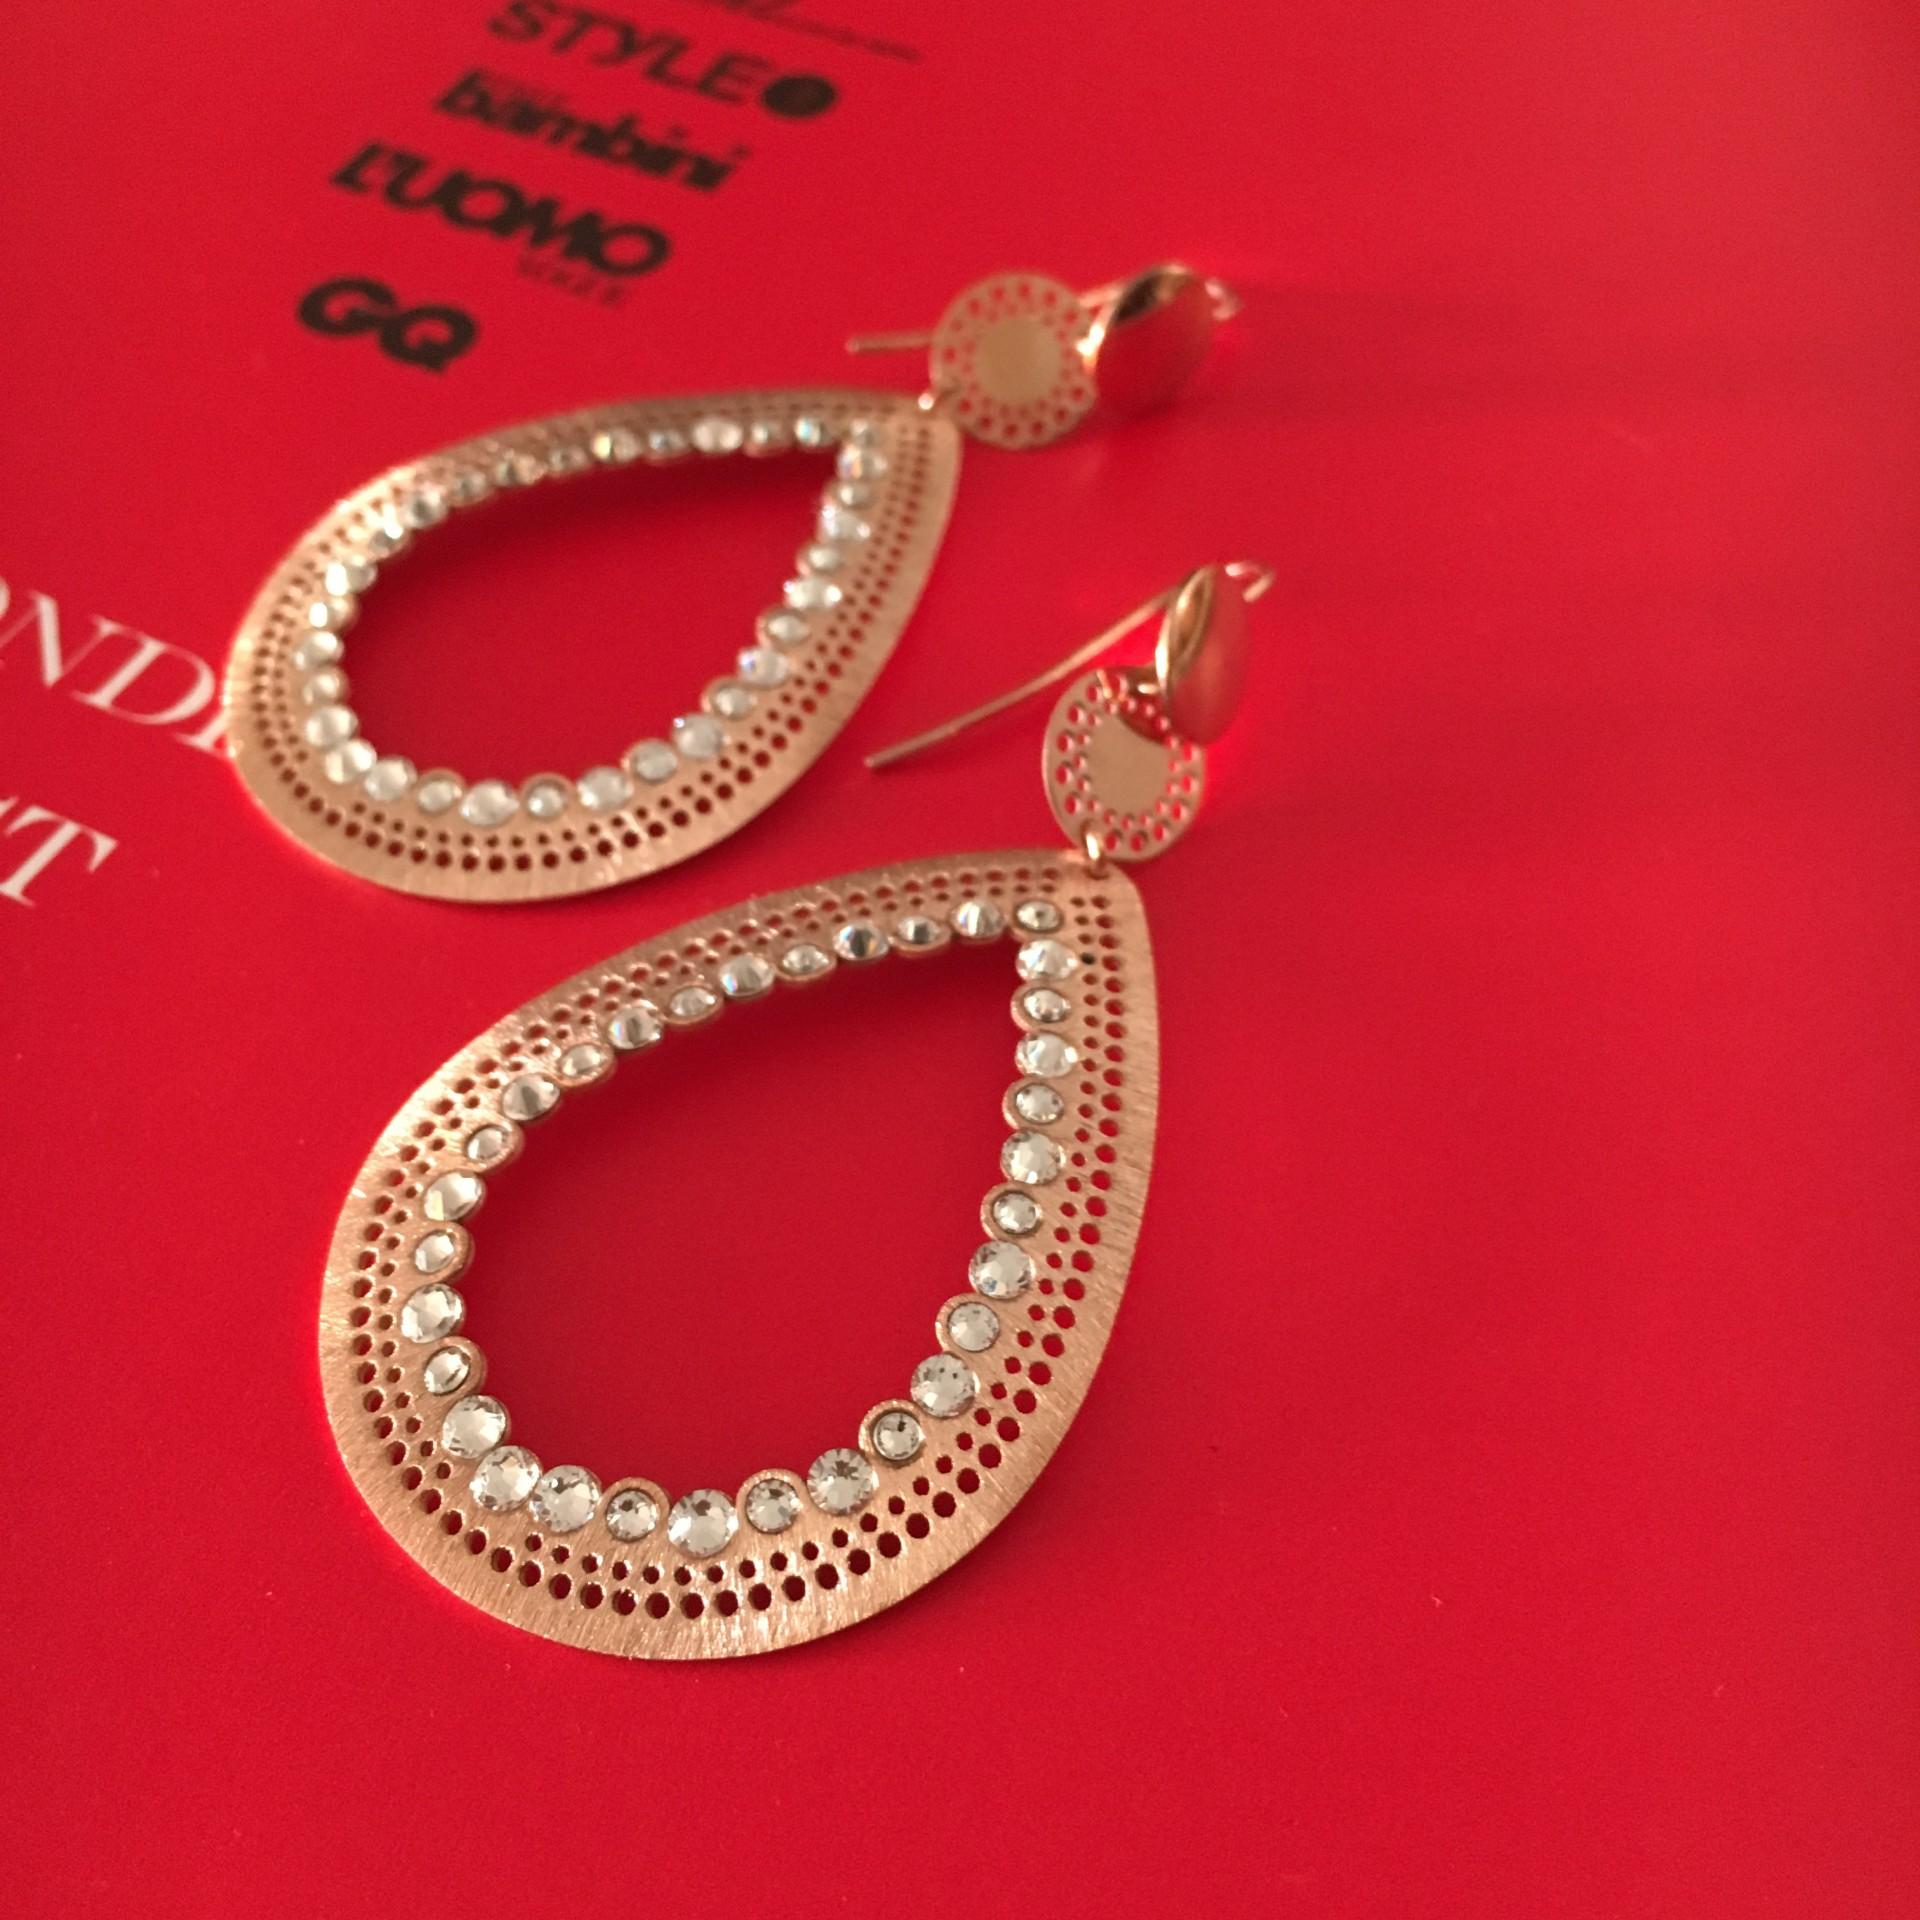 The Roxane in Rose silver earrings